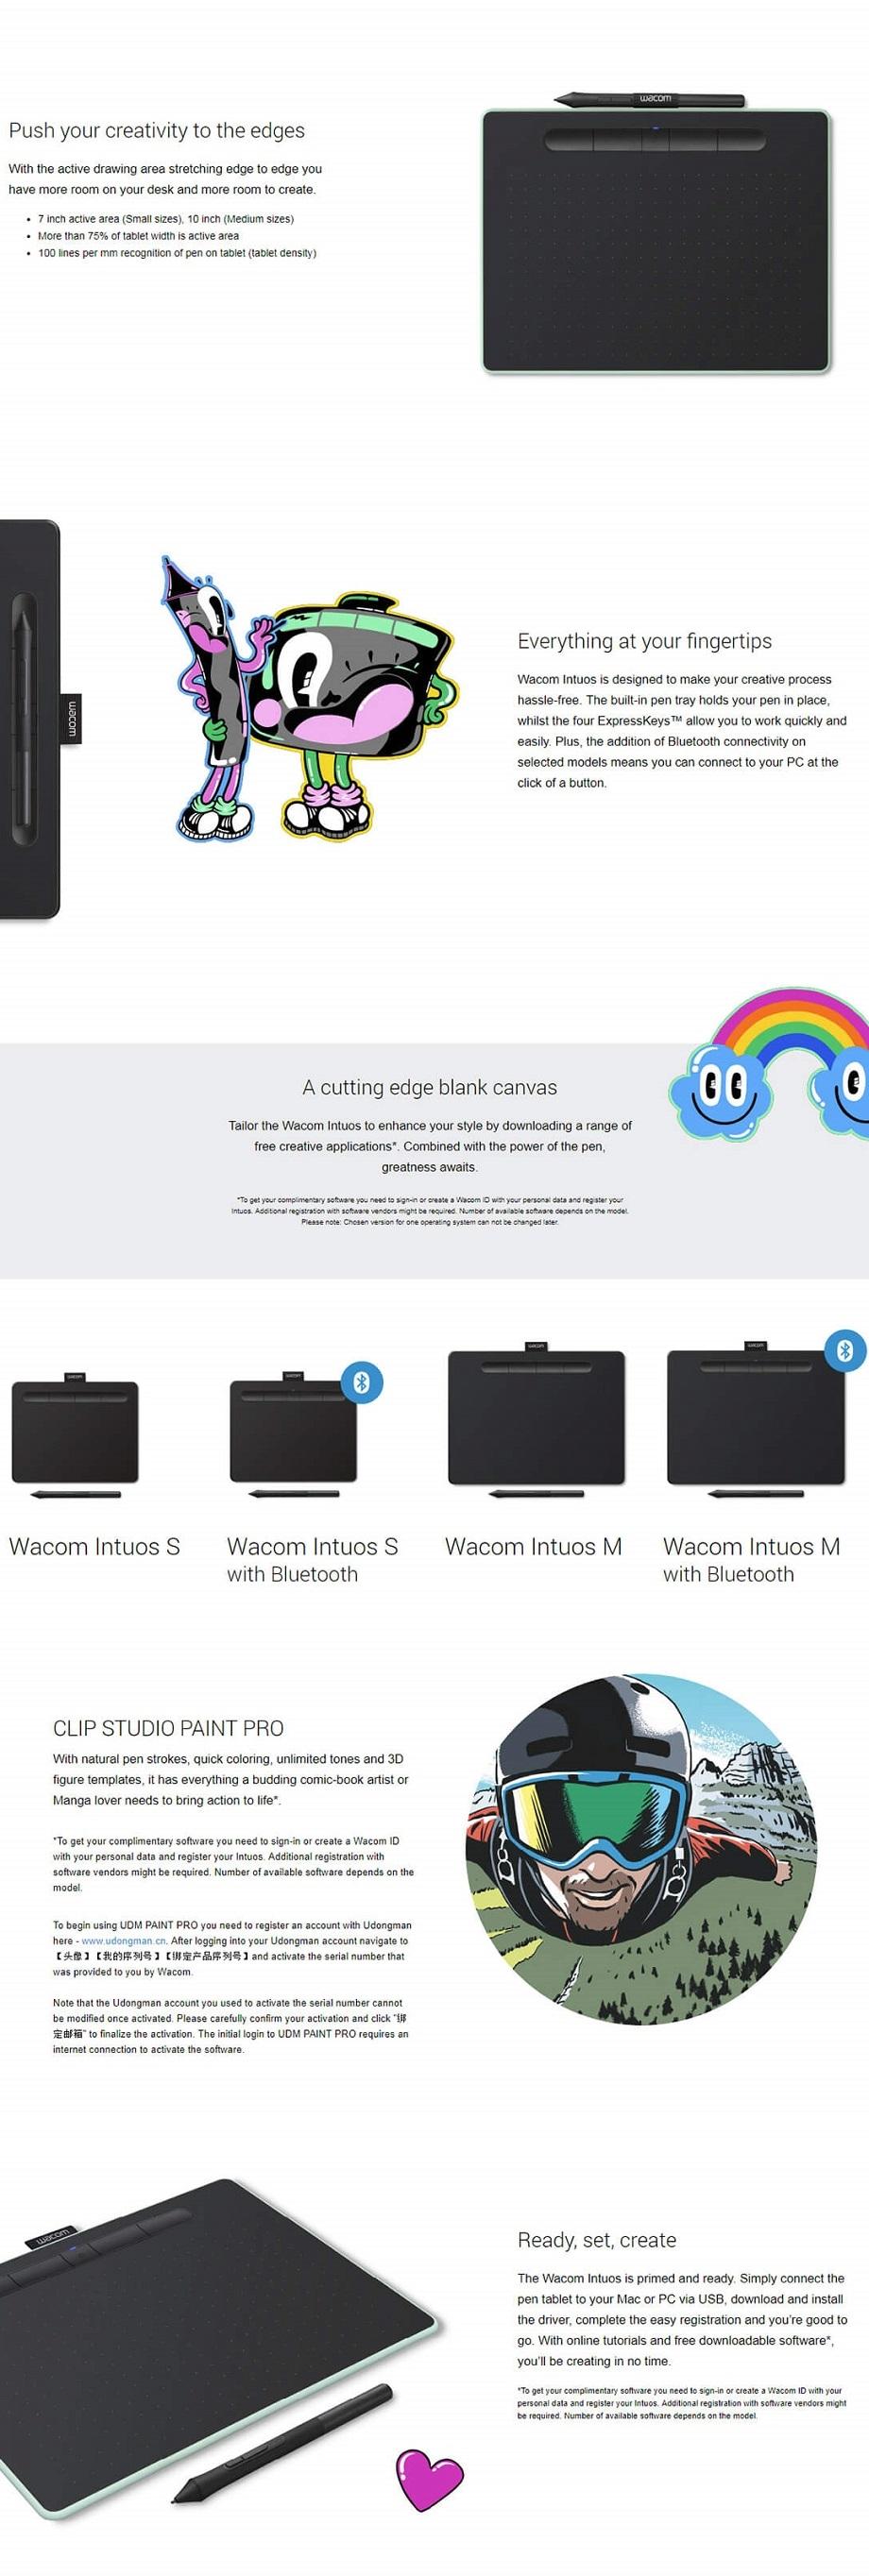 Wacom Intuos Small Bluetooth - Black